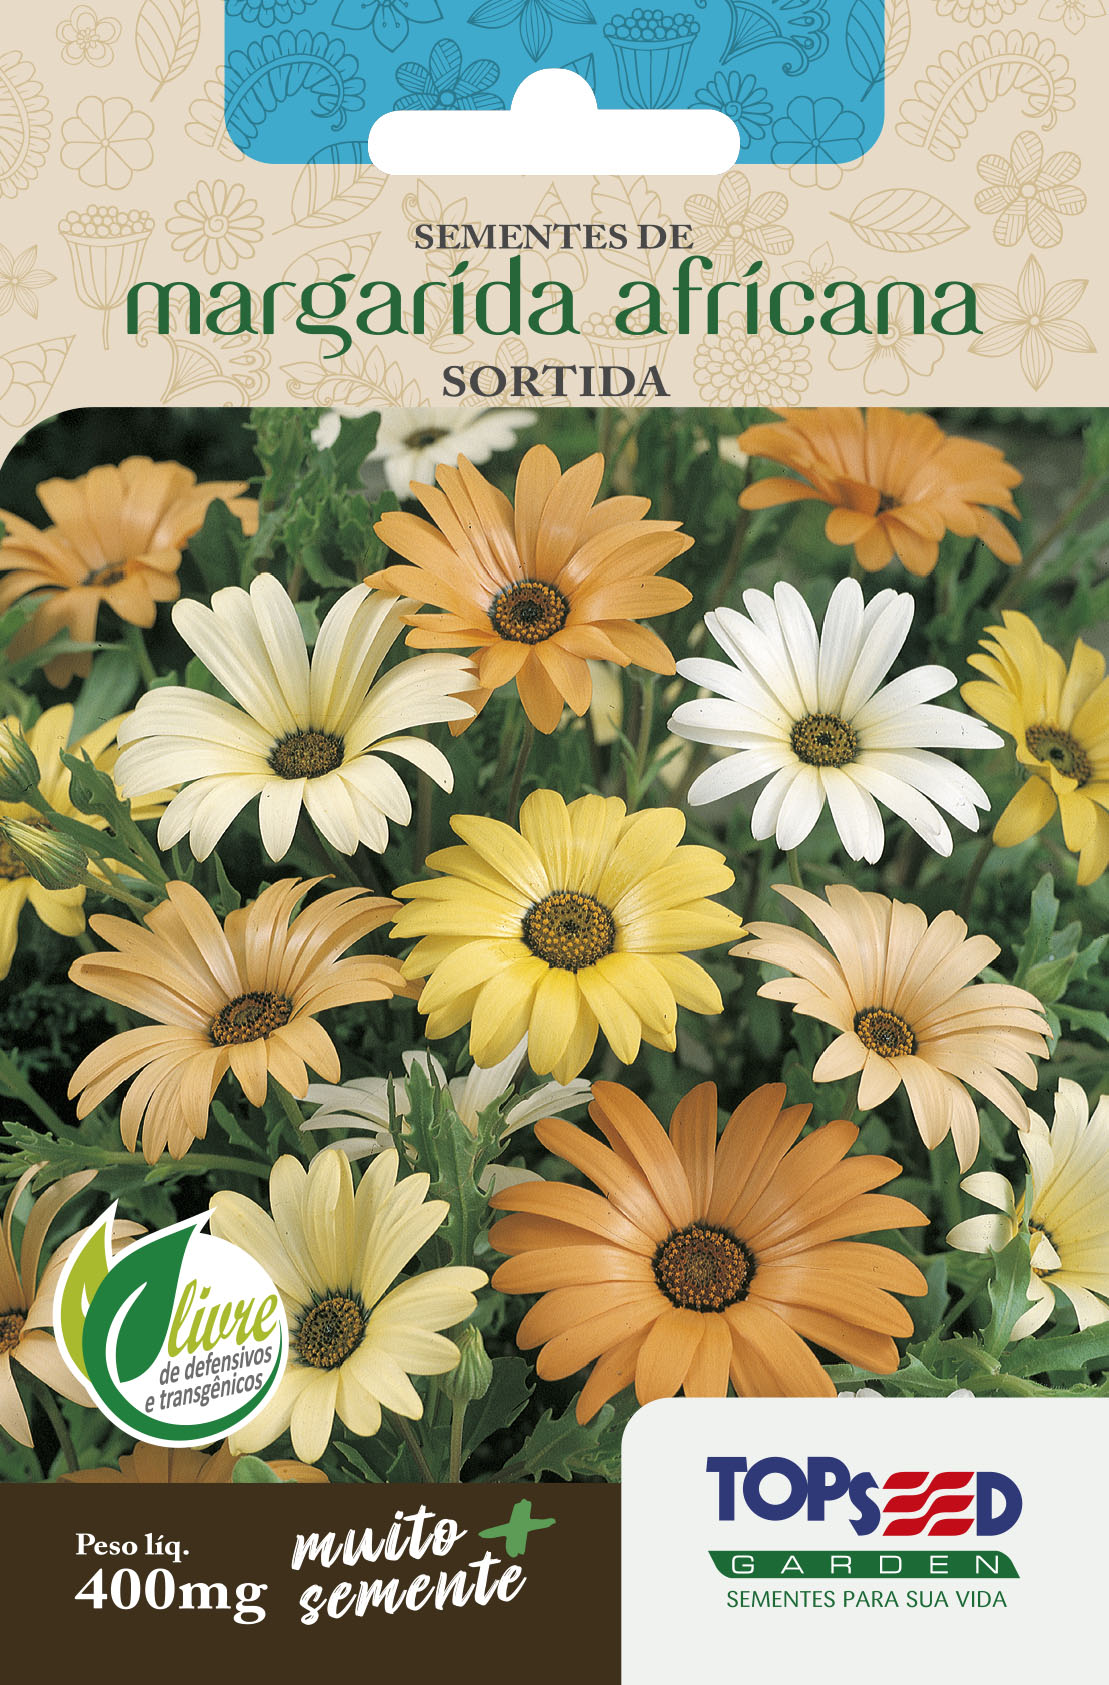 MARGARIDA AFRICANA SORTIDA